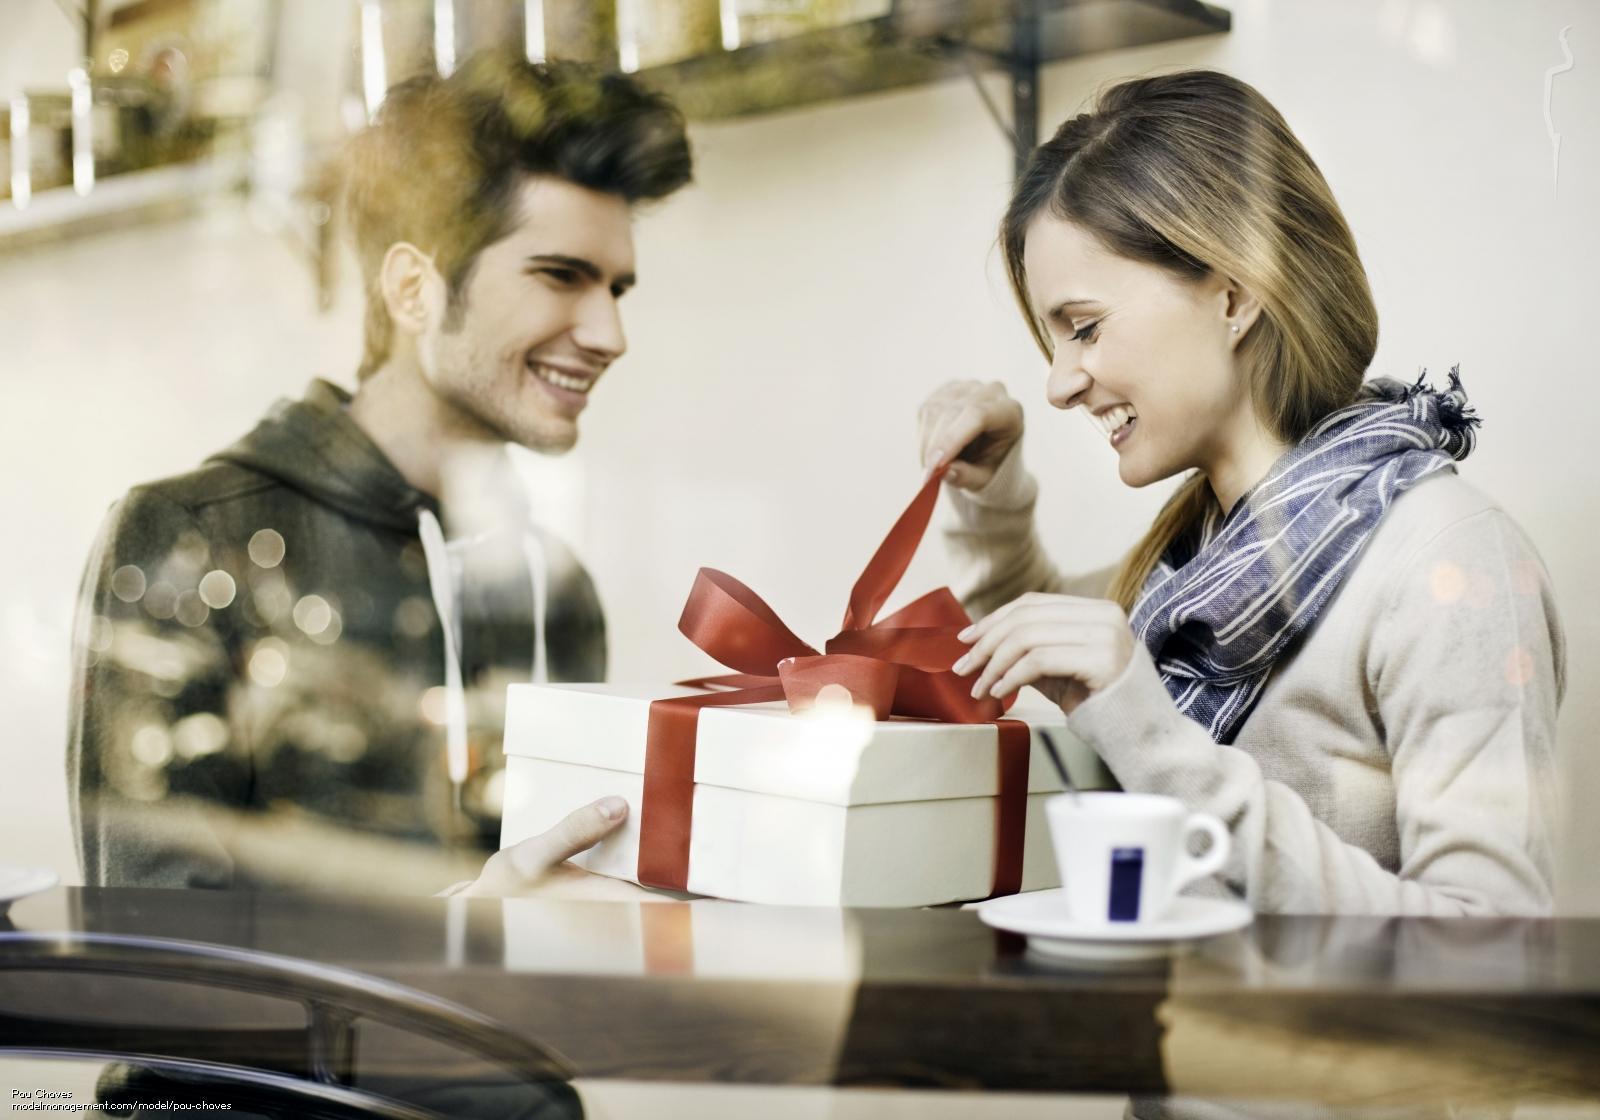 Картинки про подарки от мужчин, день рождения маме